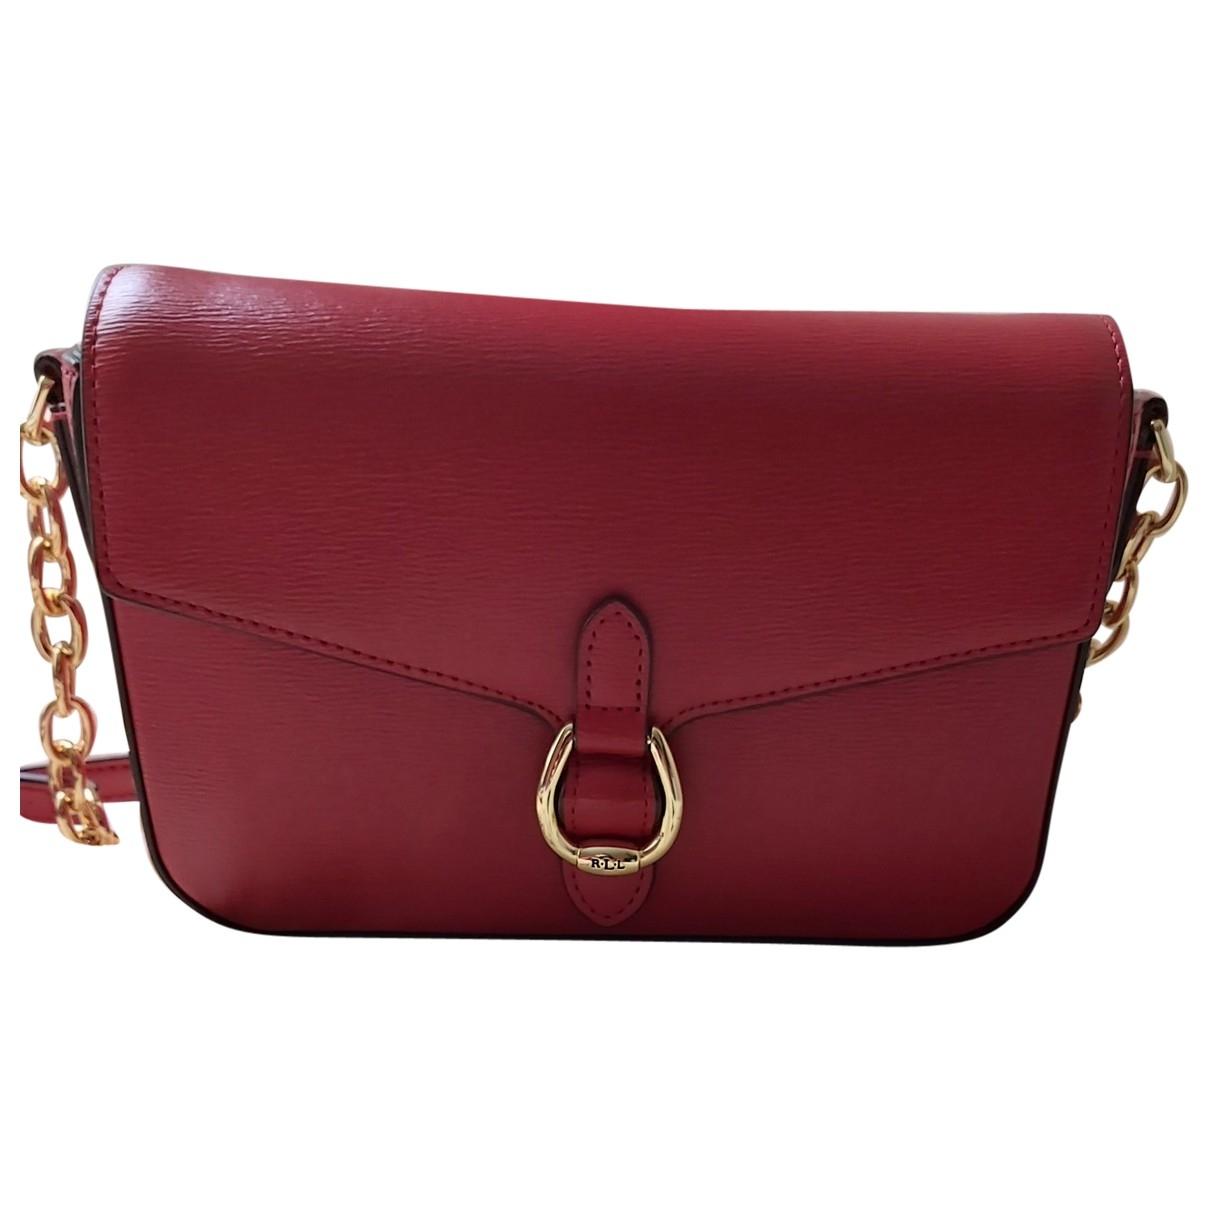 Ralph Lauren \N Red Leather handbag for Women \N